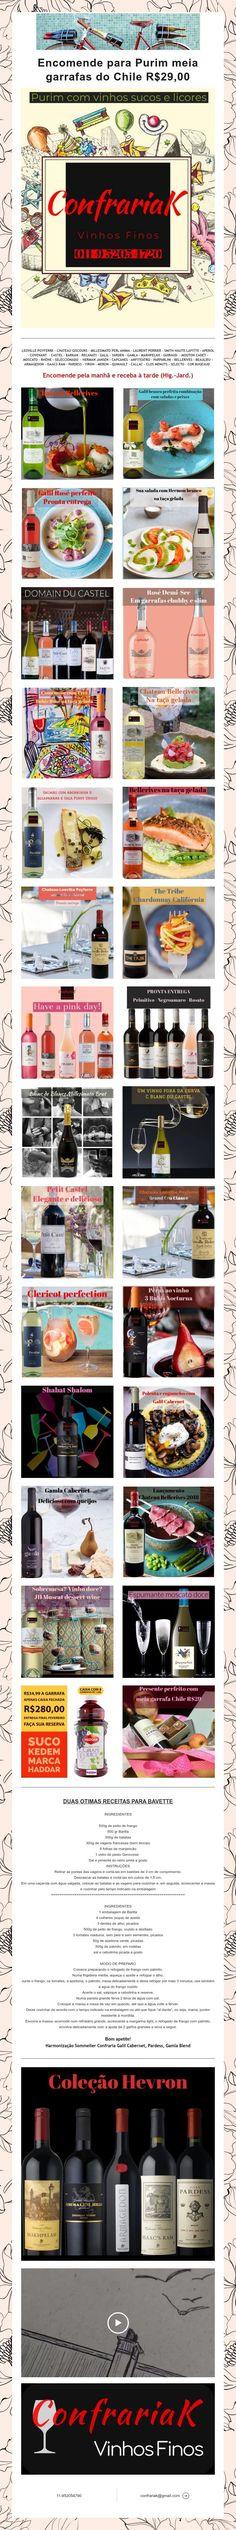 Encomende para Purim meia garrafas do Chile R$29,00 Mouton Cadet, Laurent Perrier, Chile, Wine Pairings, Sock, Bottles, Chili